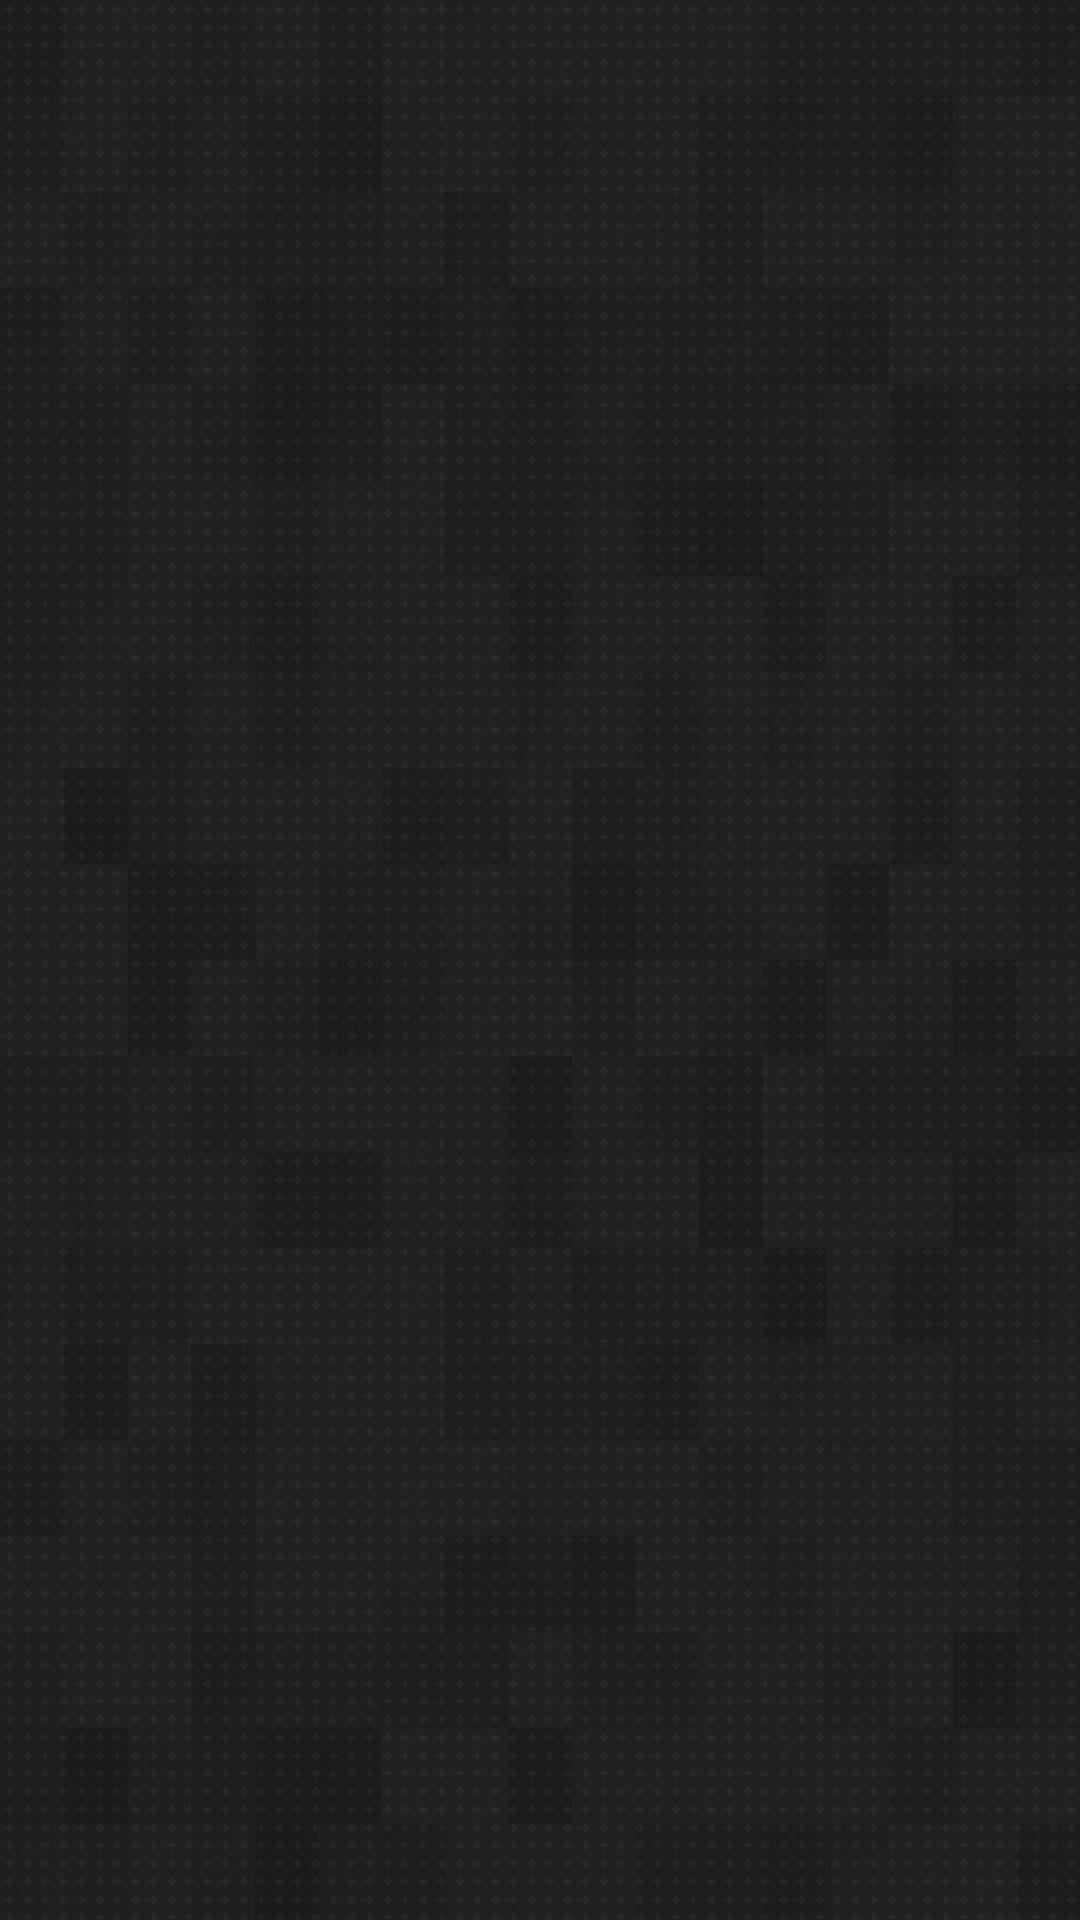 4k Ultra Hd Dark Phone Wallpapers Top Free 4k Ultra Hd Dark Phone Backgrounds Wallpaperaccess